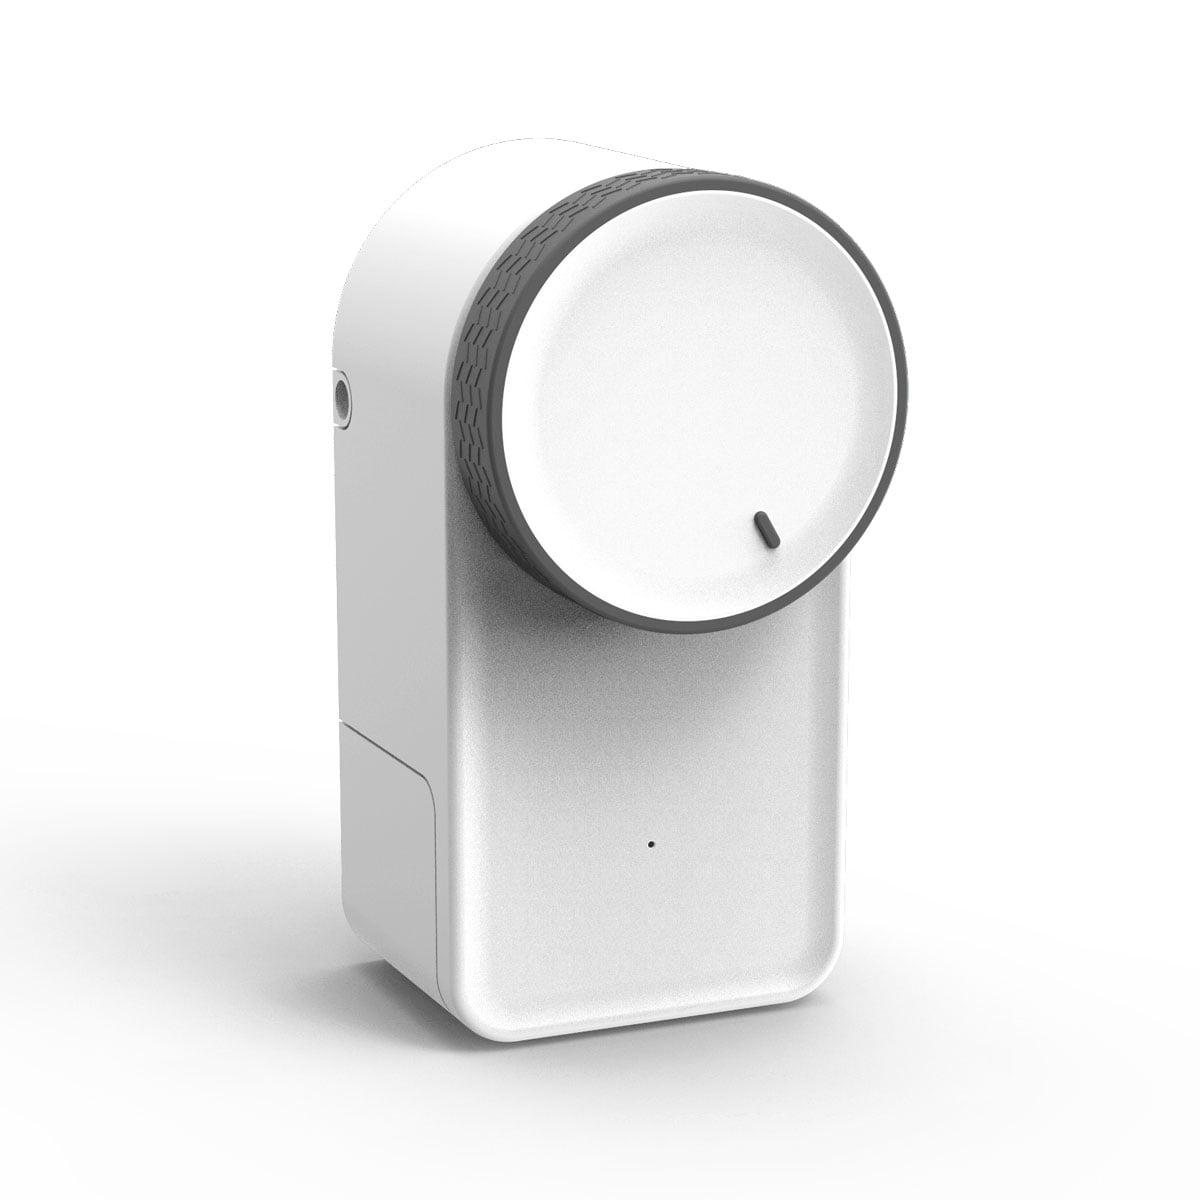 Keymitt Smart Lock – Homekit News and Reviews